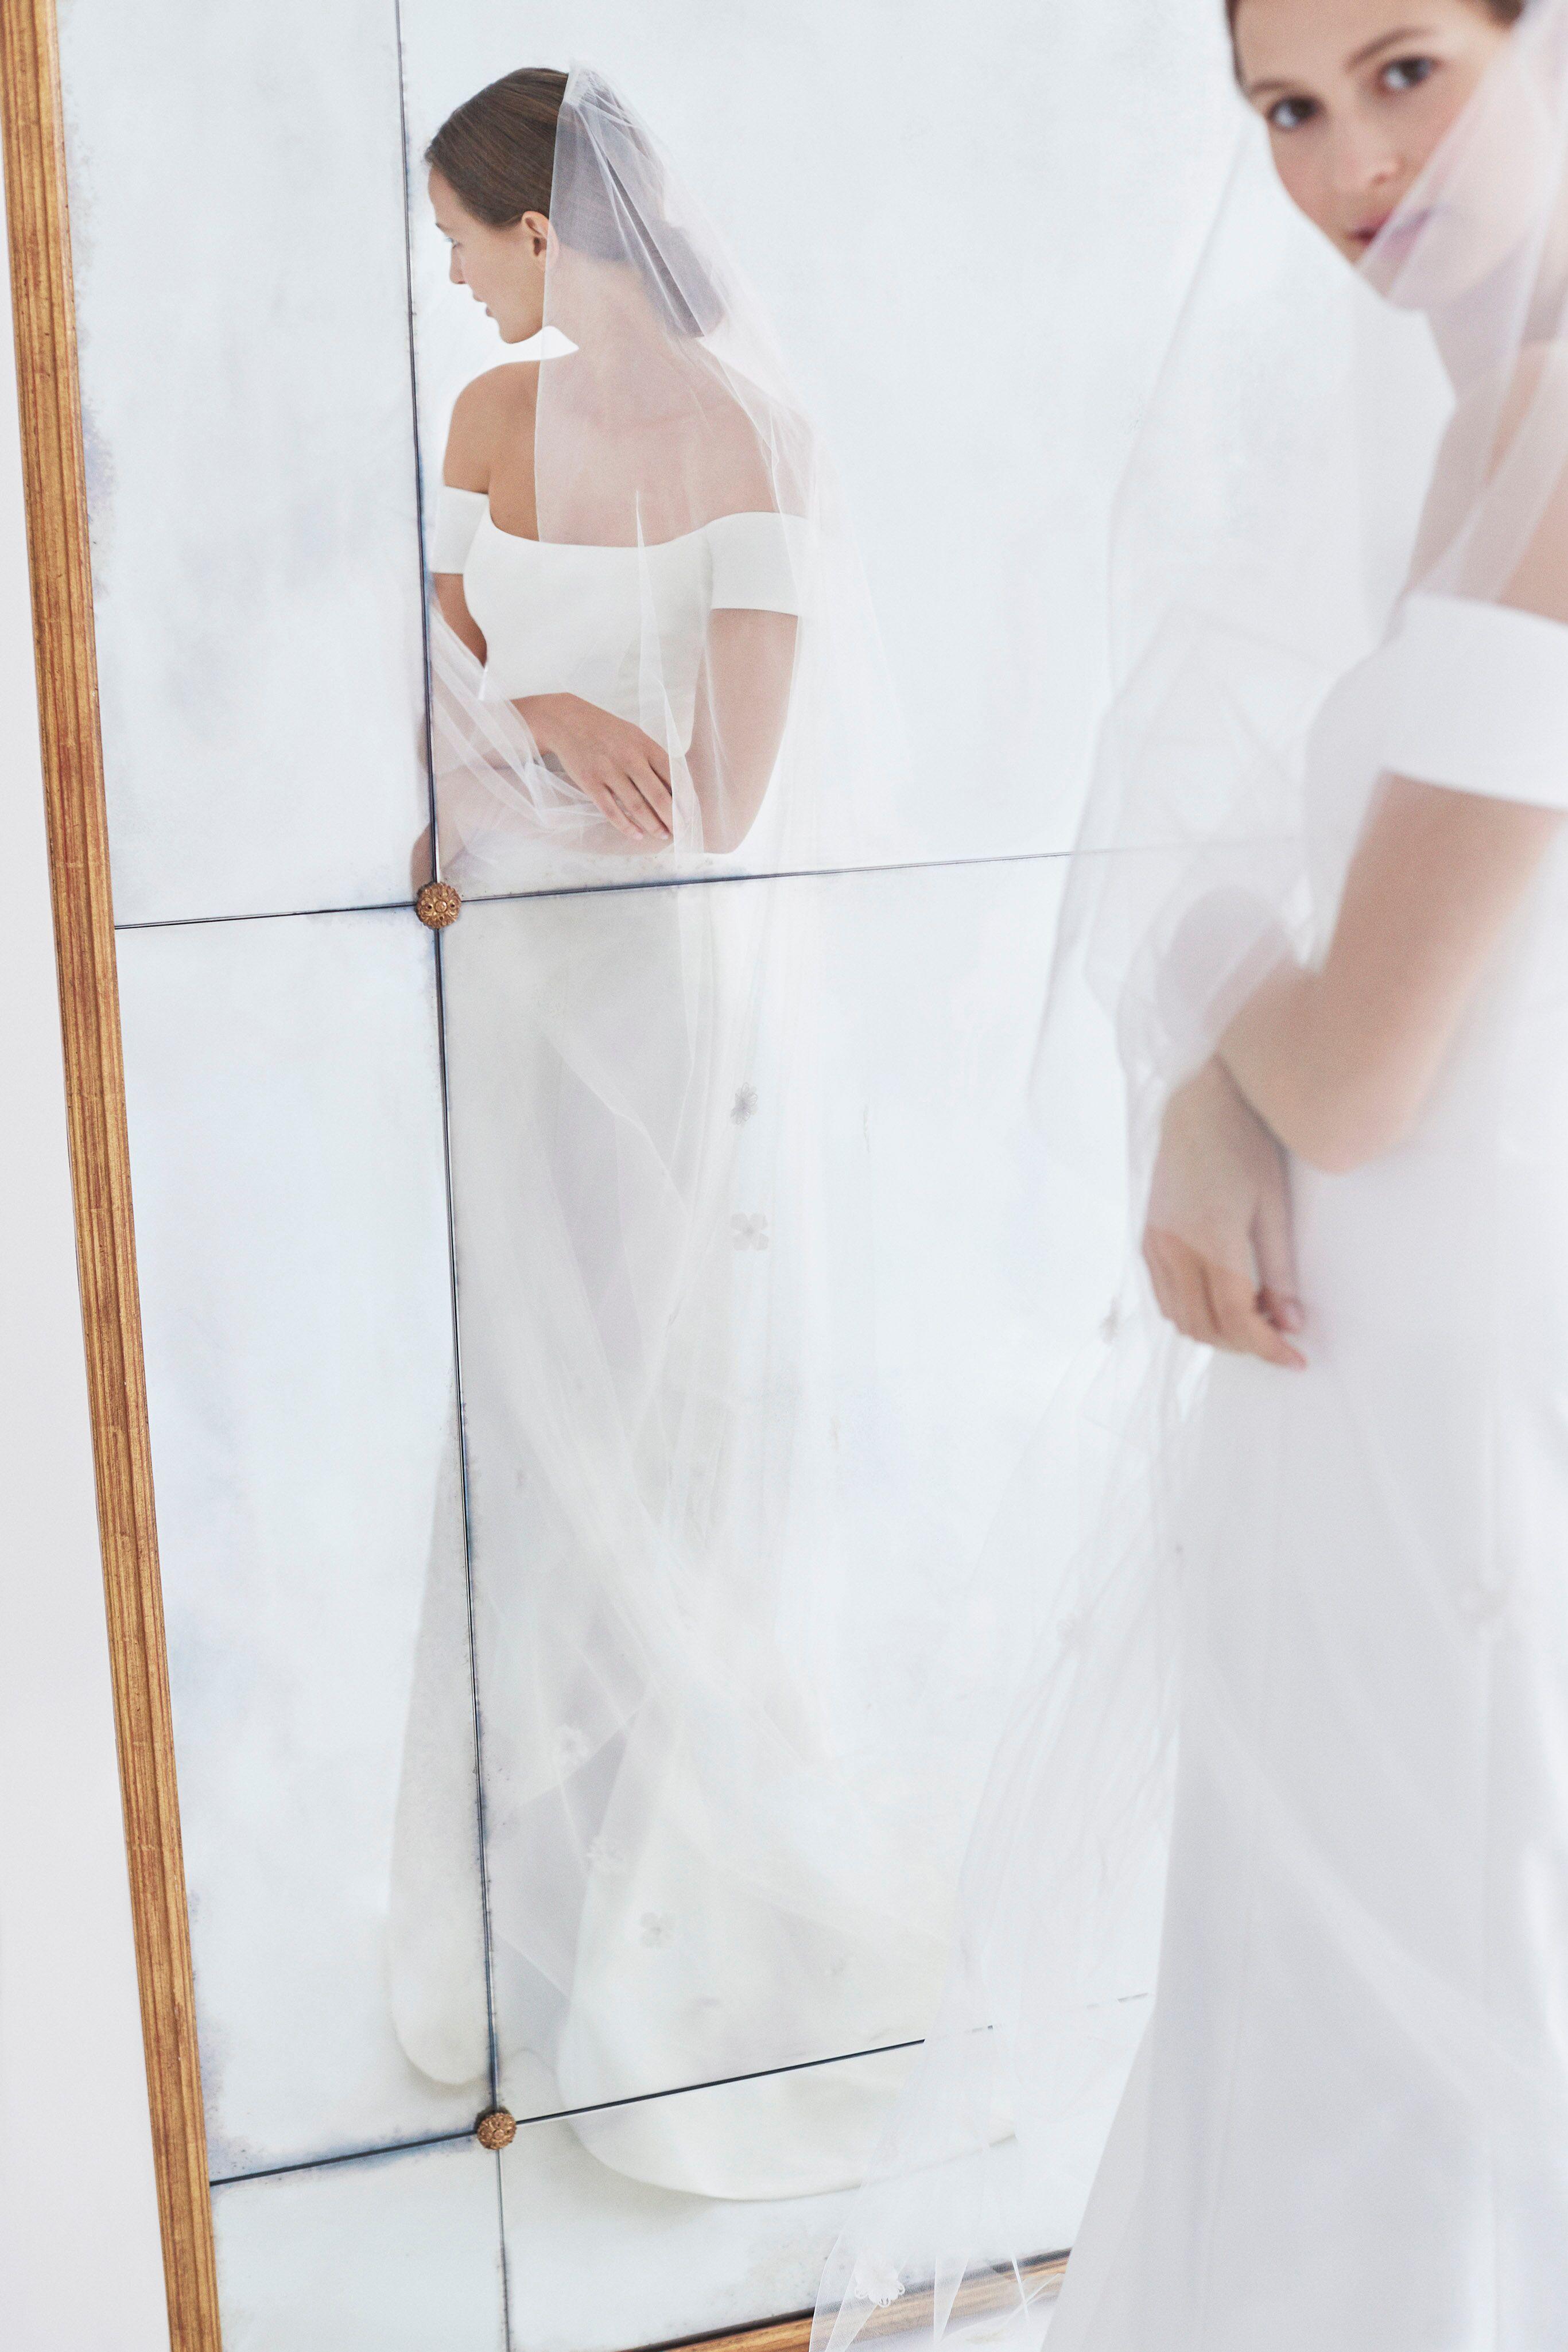 186179f90f1be L'elite Bridal and Bridesmaids Boutique | Bridal Salons - Boston, MA